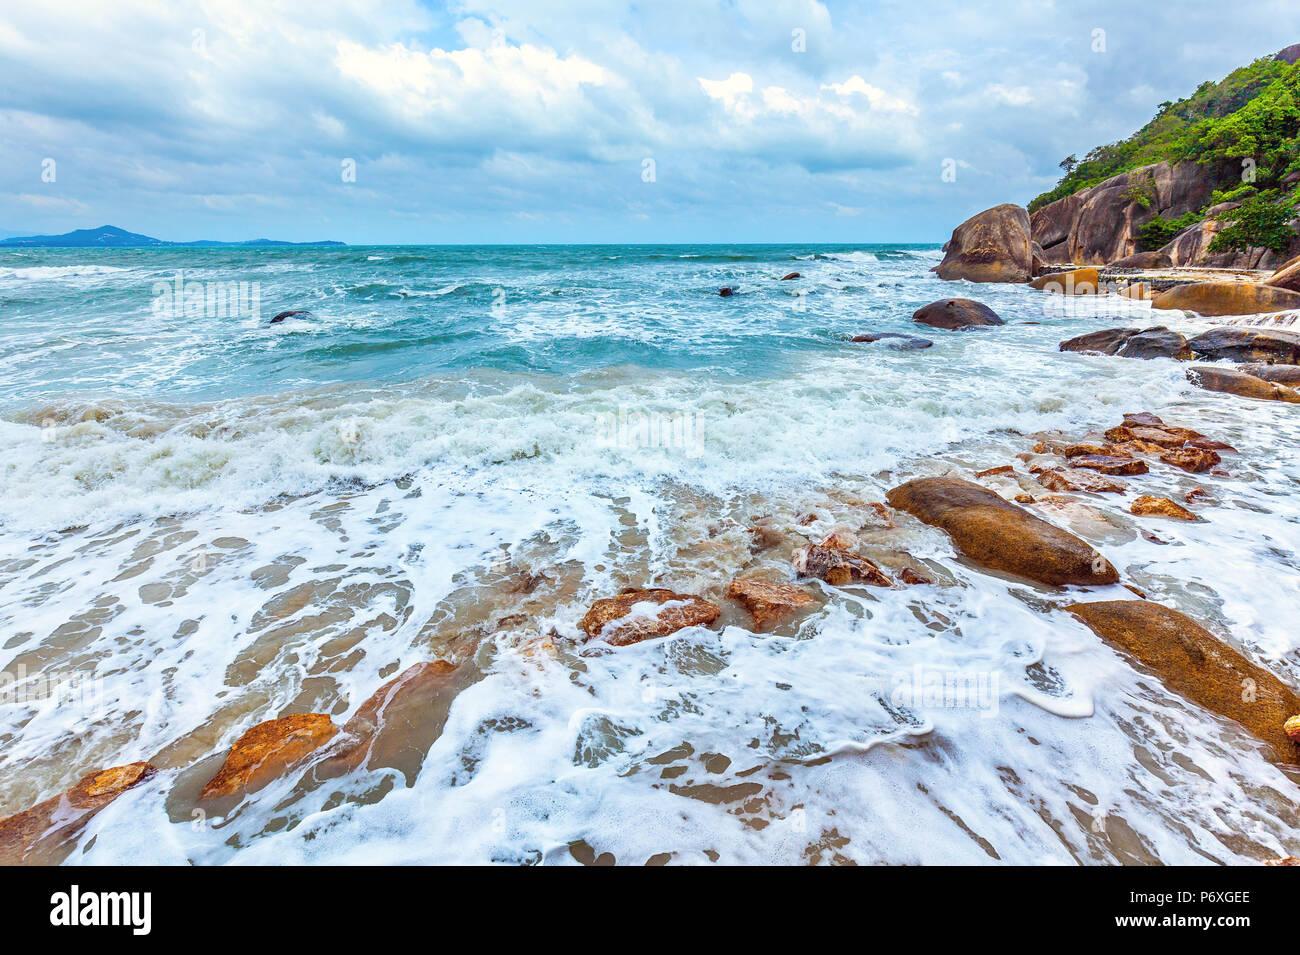 Sturm auf der Crystal Bay Strand. Koh Samui, Thailand. Stockbild